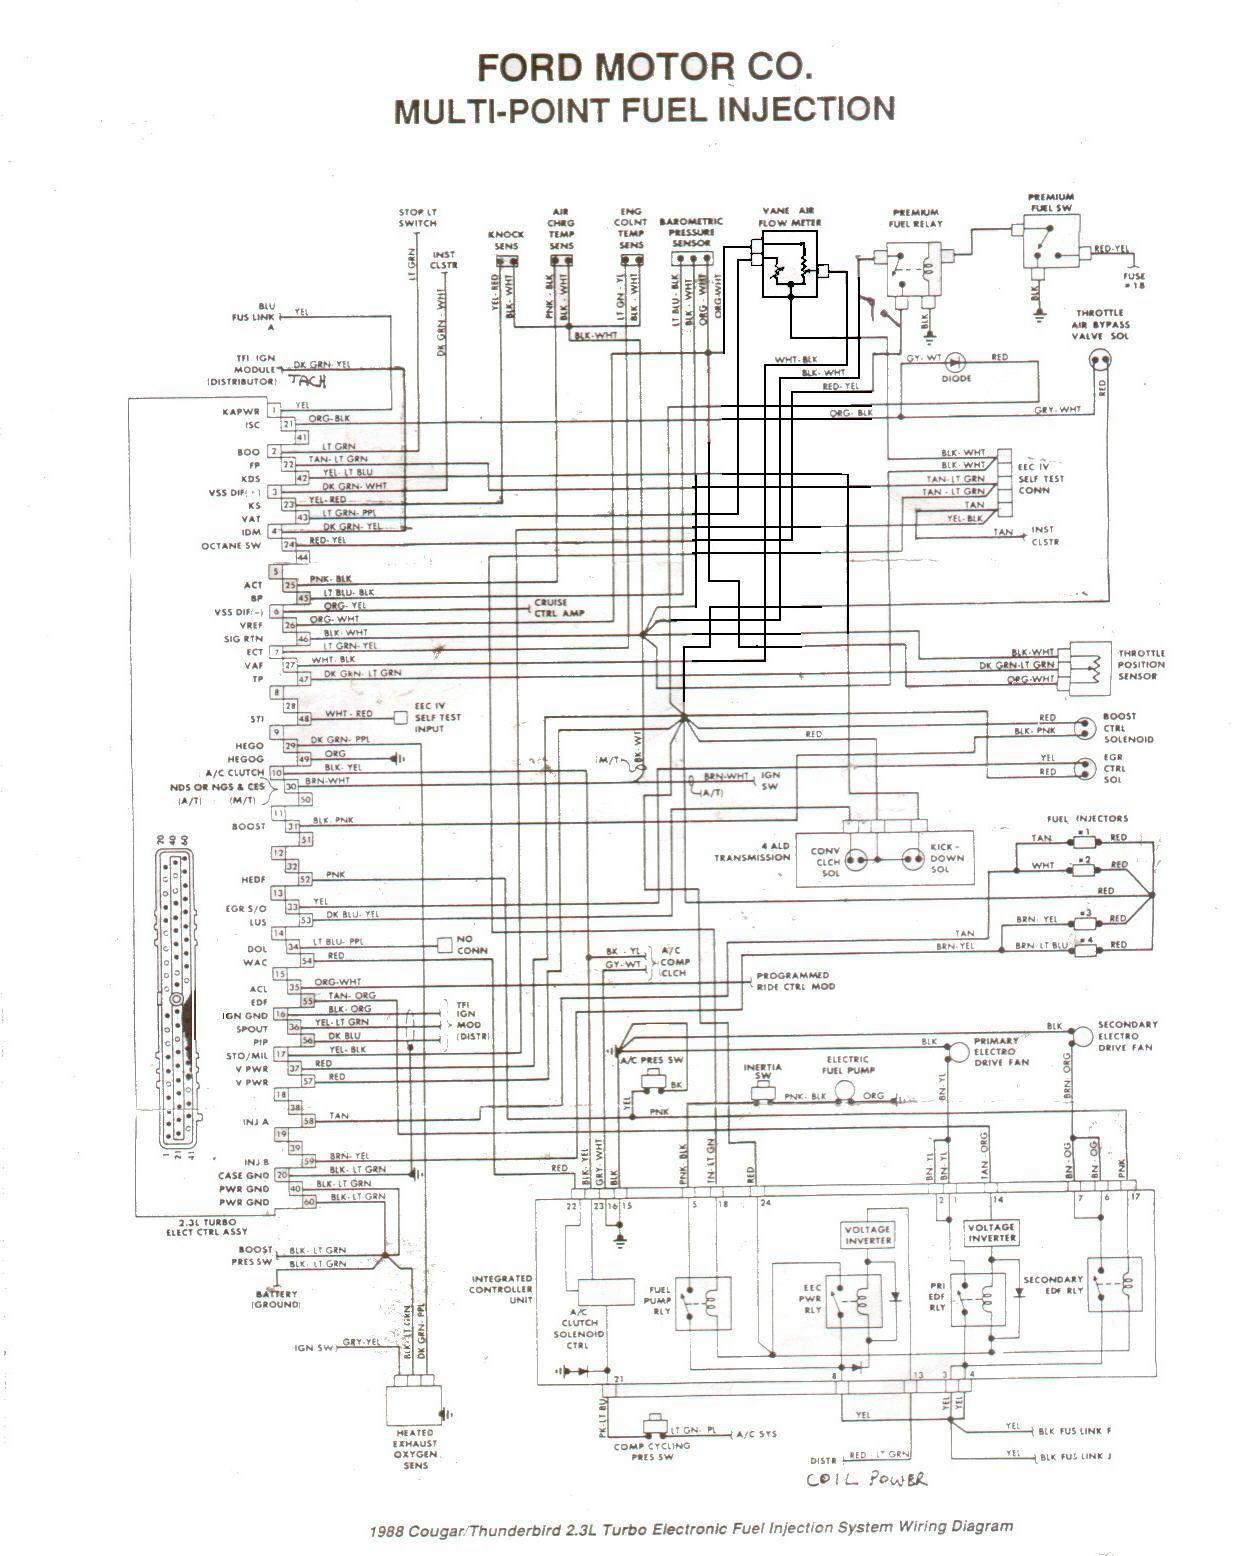 Manuals 1957 Thunderbird Wiring Diagram Pdf Full Version Hd Quality Wiring Diagram Pdf Userguidesmanualcom Iz3dba It